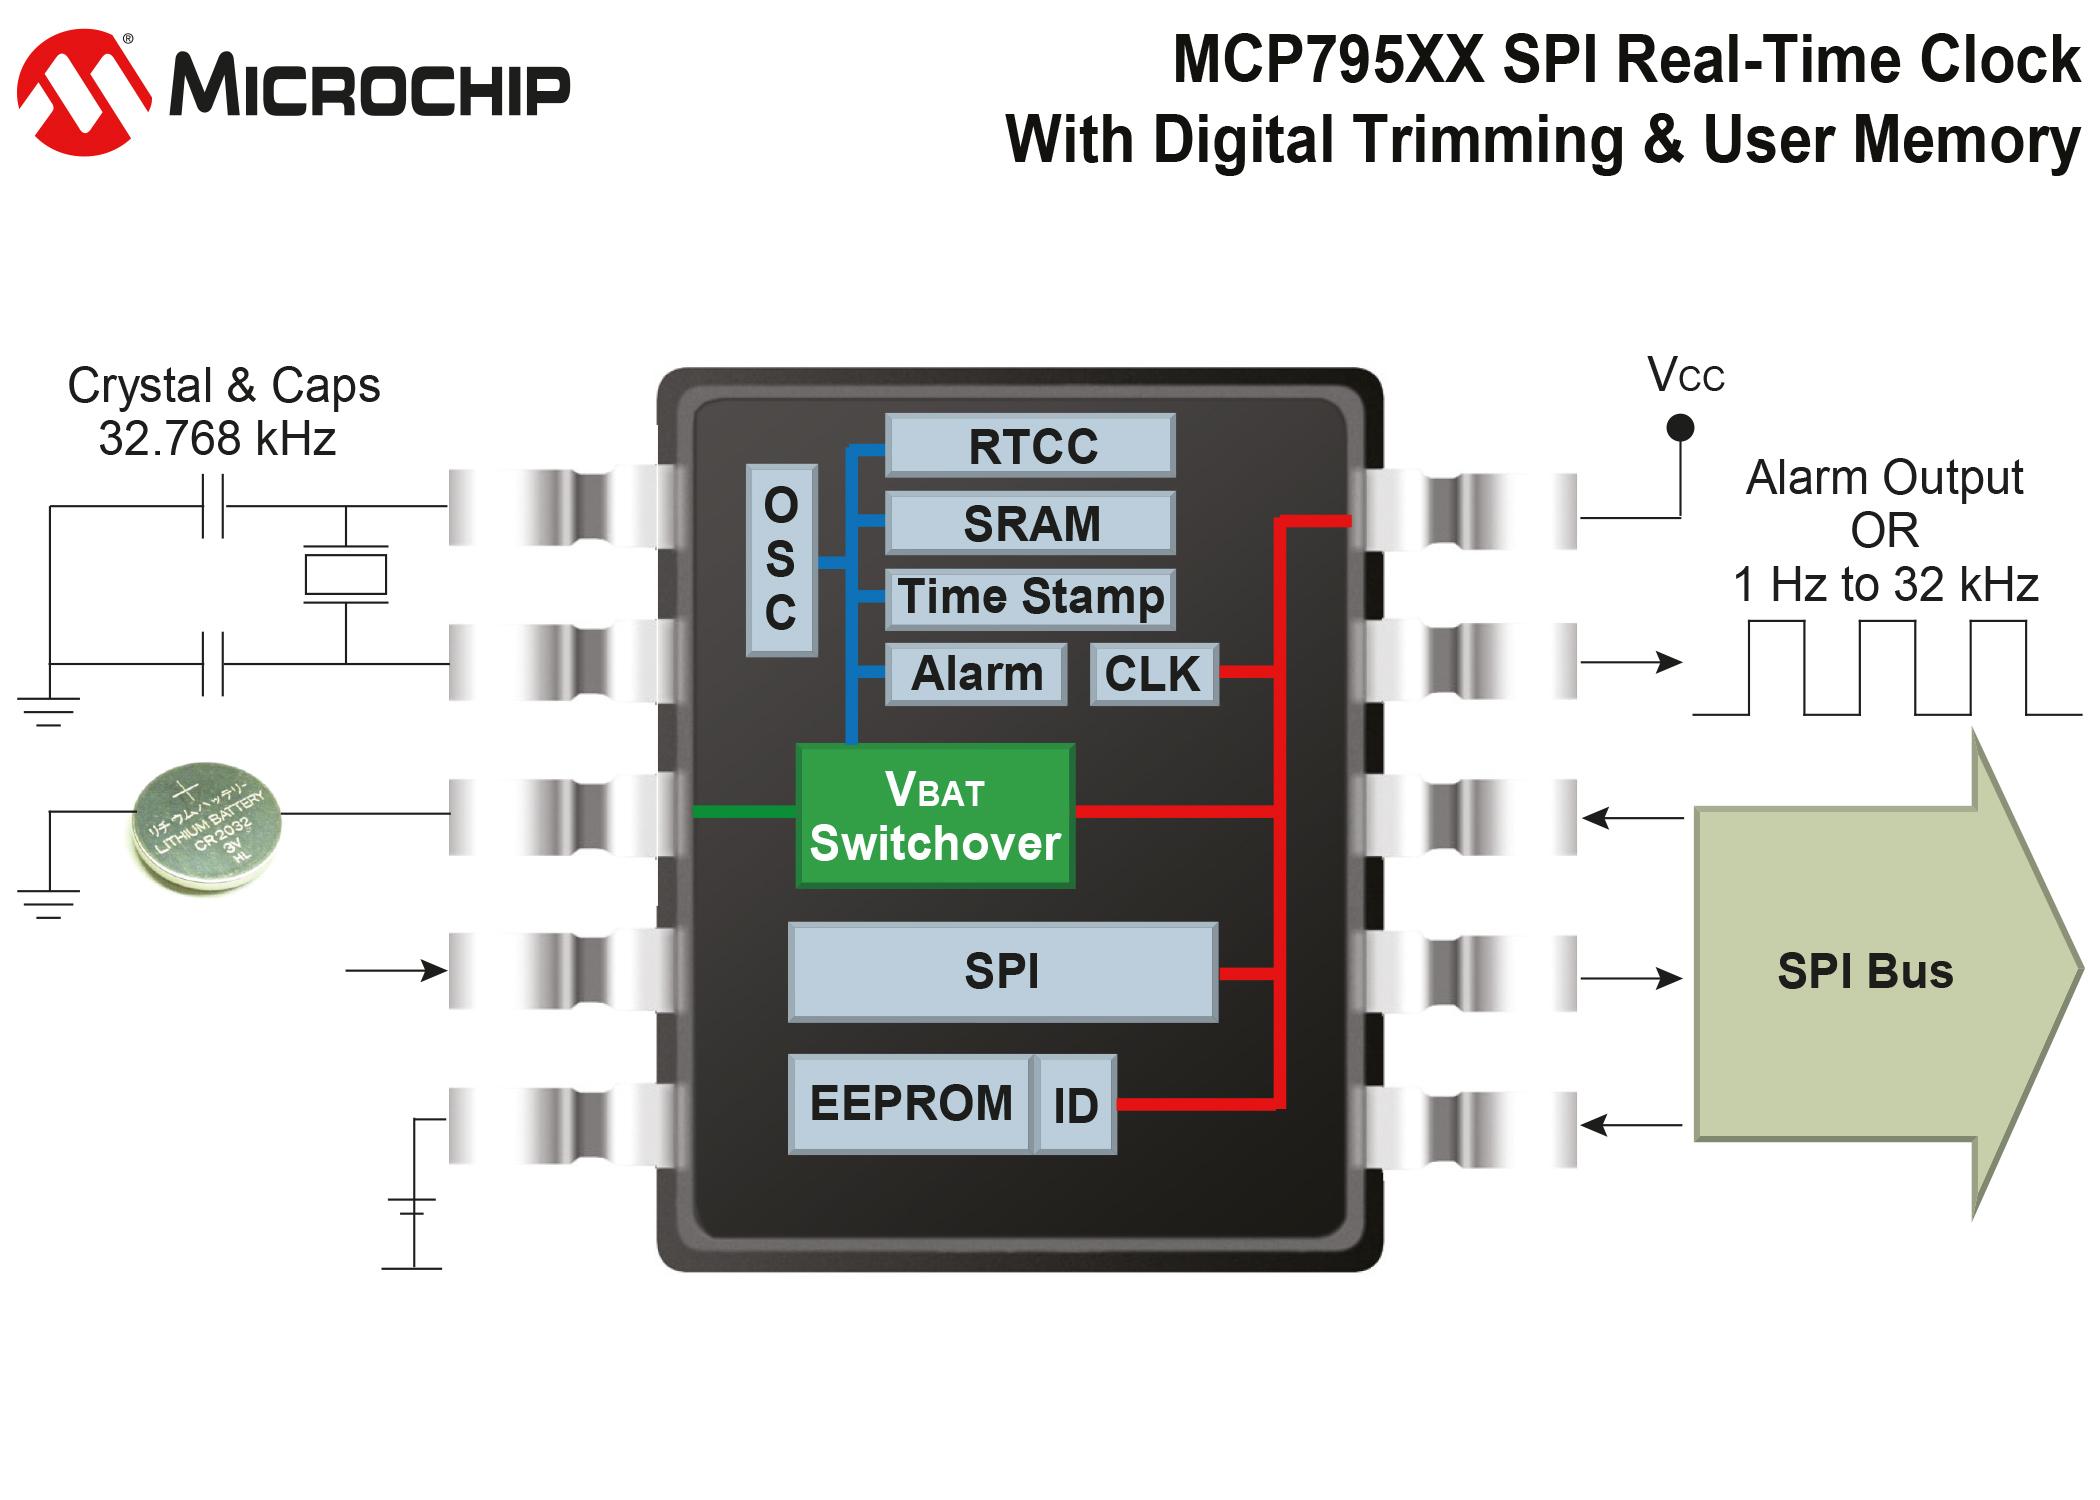 mcp795xx-real-time-clock_7640552656_o